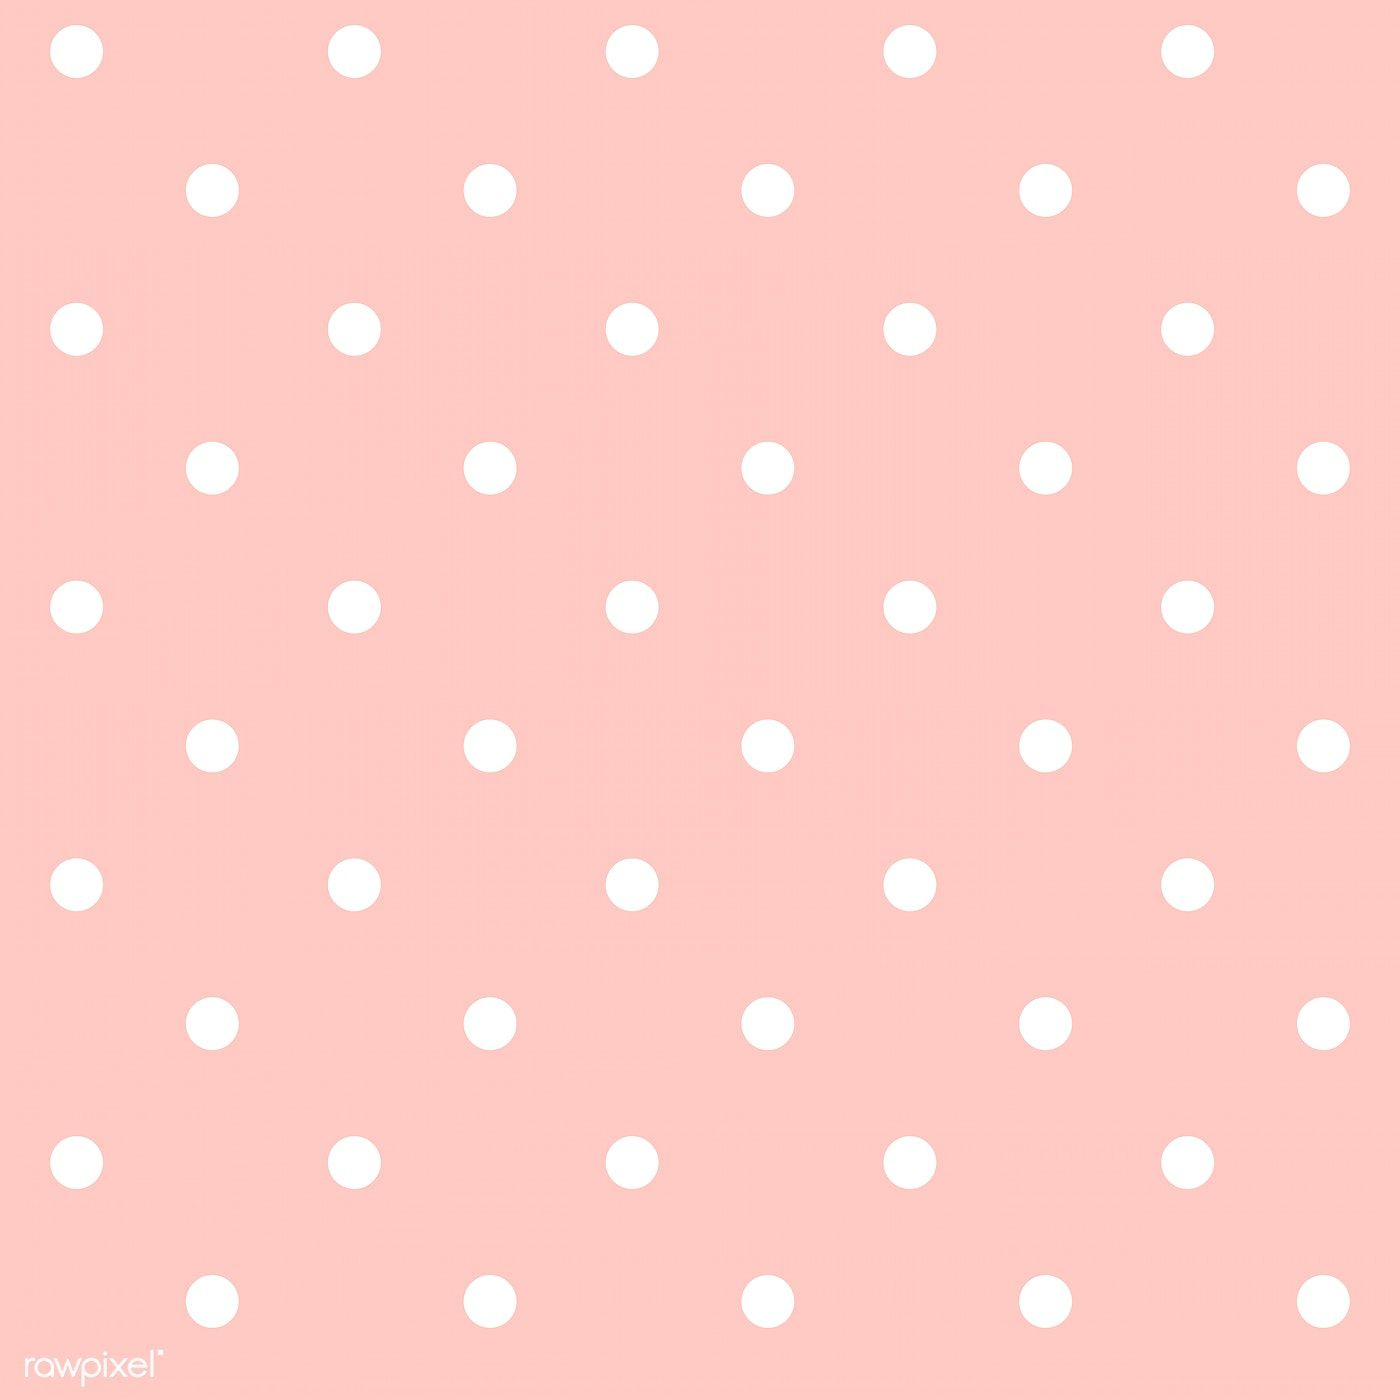 Pastel Pink And White Seamless Polka Dot Pattern Vector Free Image By Rawpixel Co Polka Dots Wallpaper Pastel Pink Wallpaper Iphone Pink Polka Dots Wallpaper